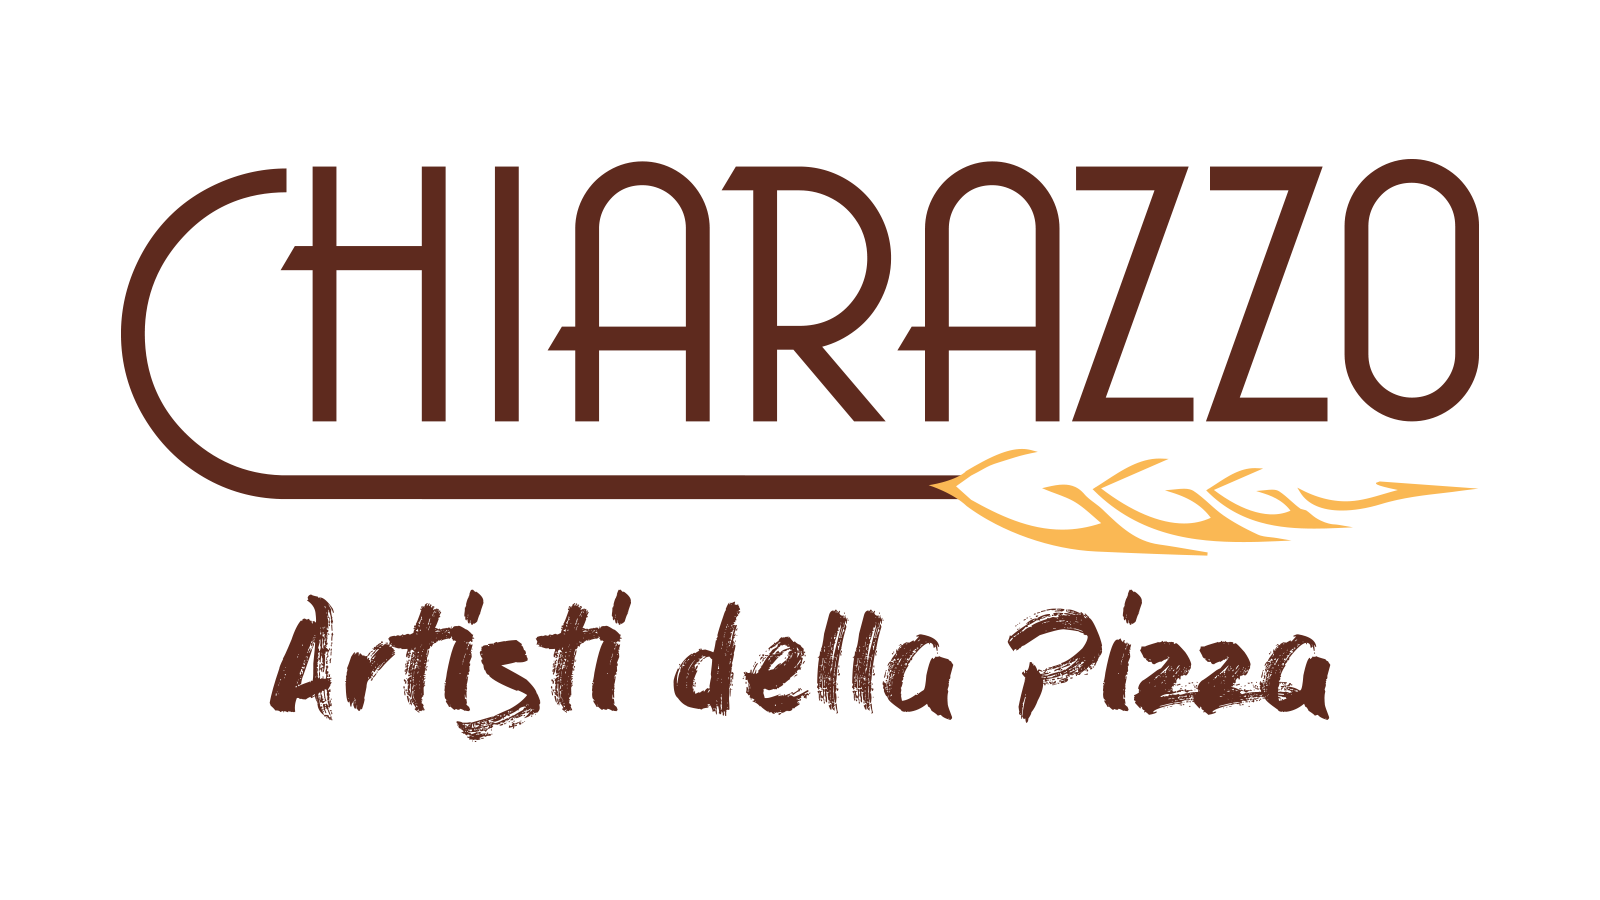 Chiarazzo